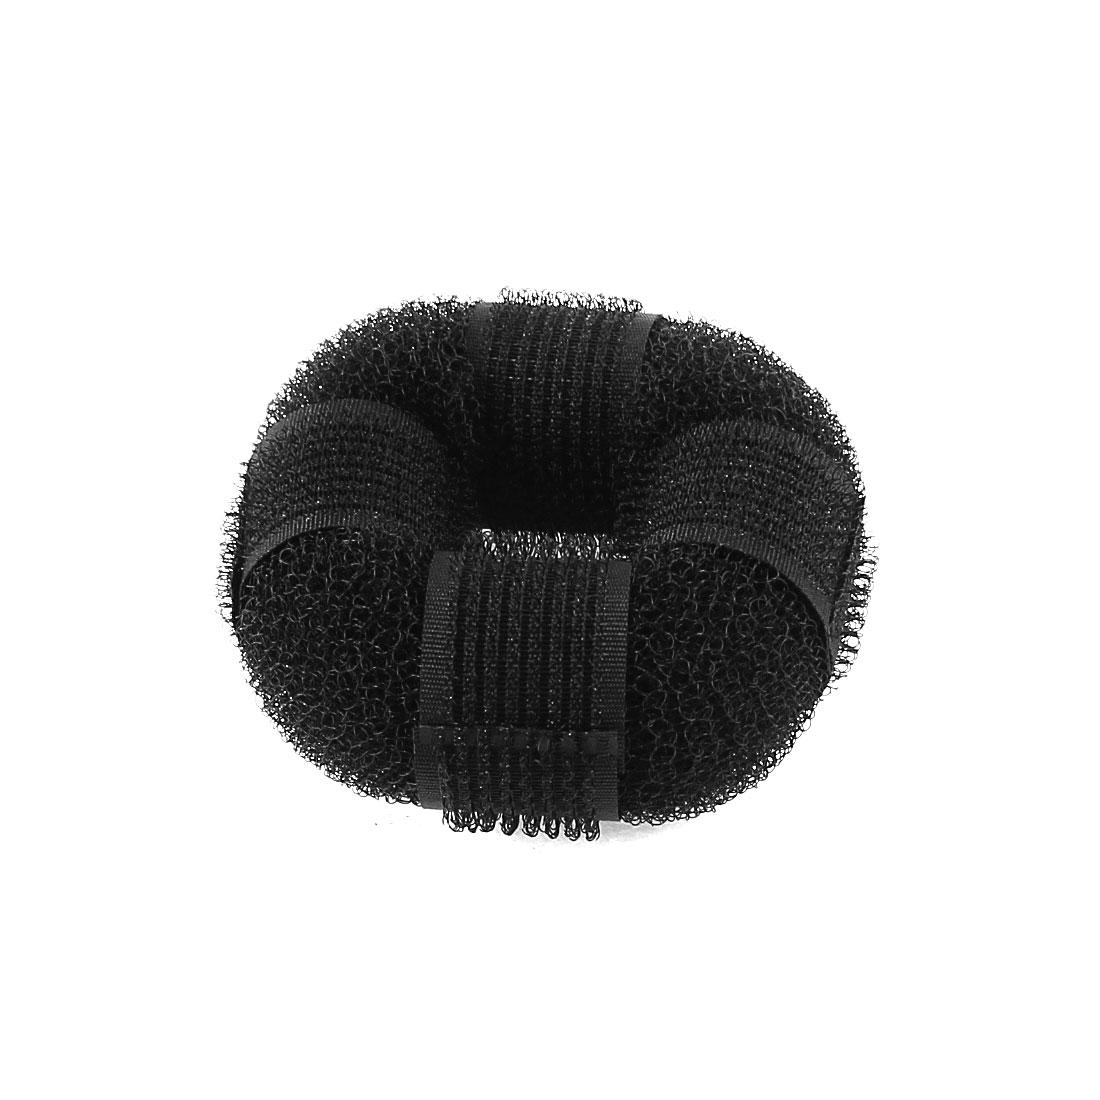 Hairdressing Tools Magic Donut Bun Circle Updo Ring Hair Device Band Black